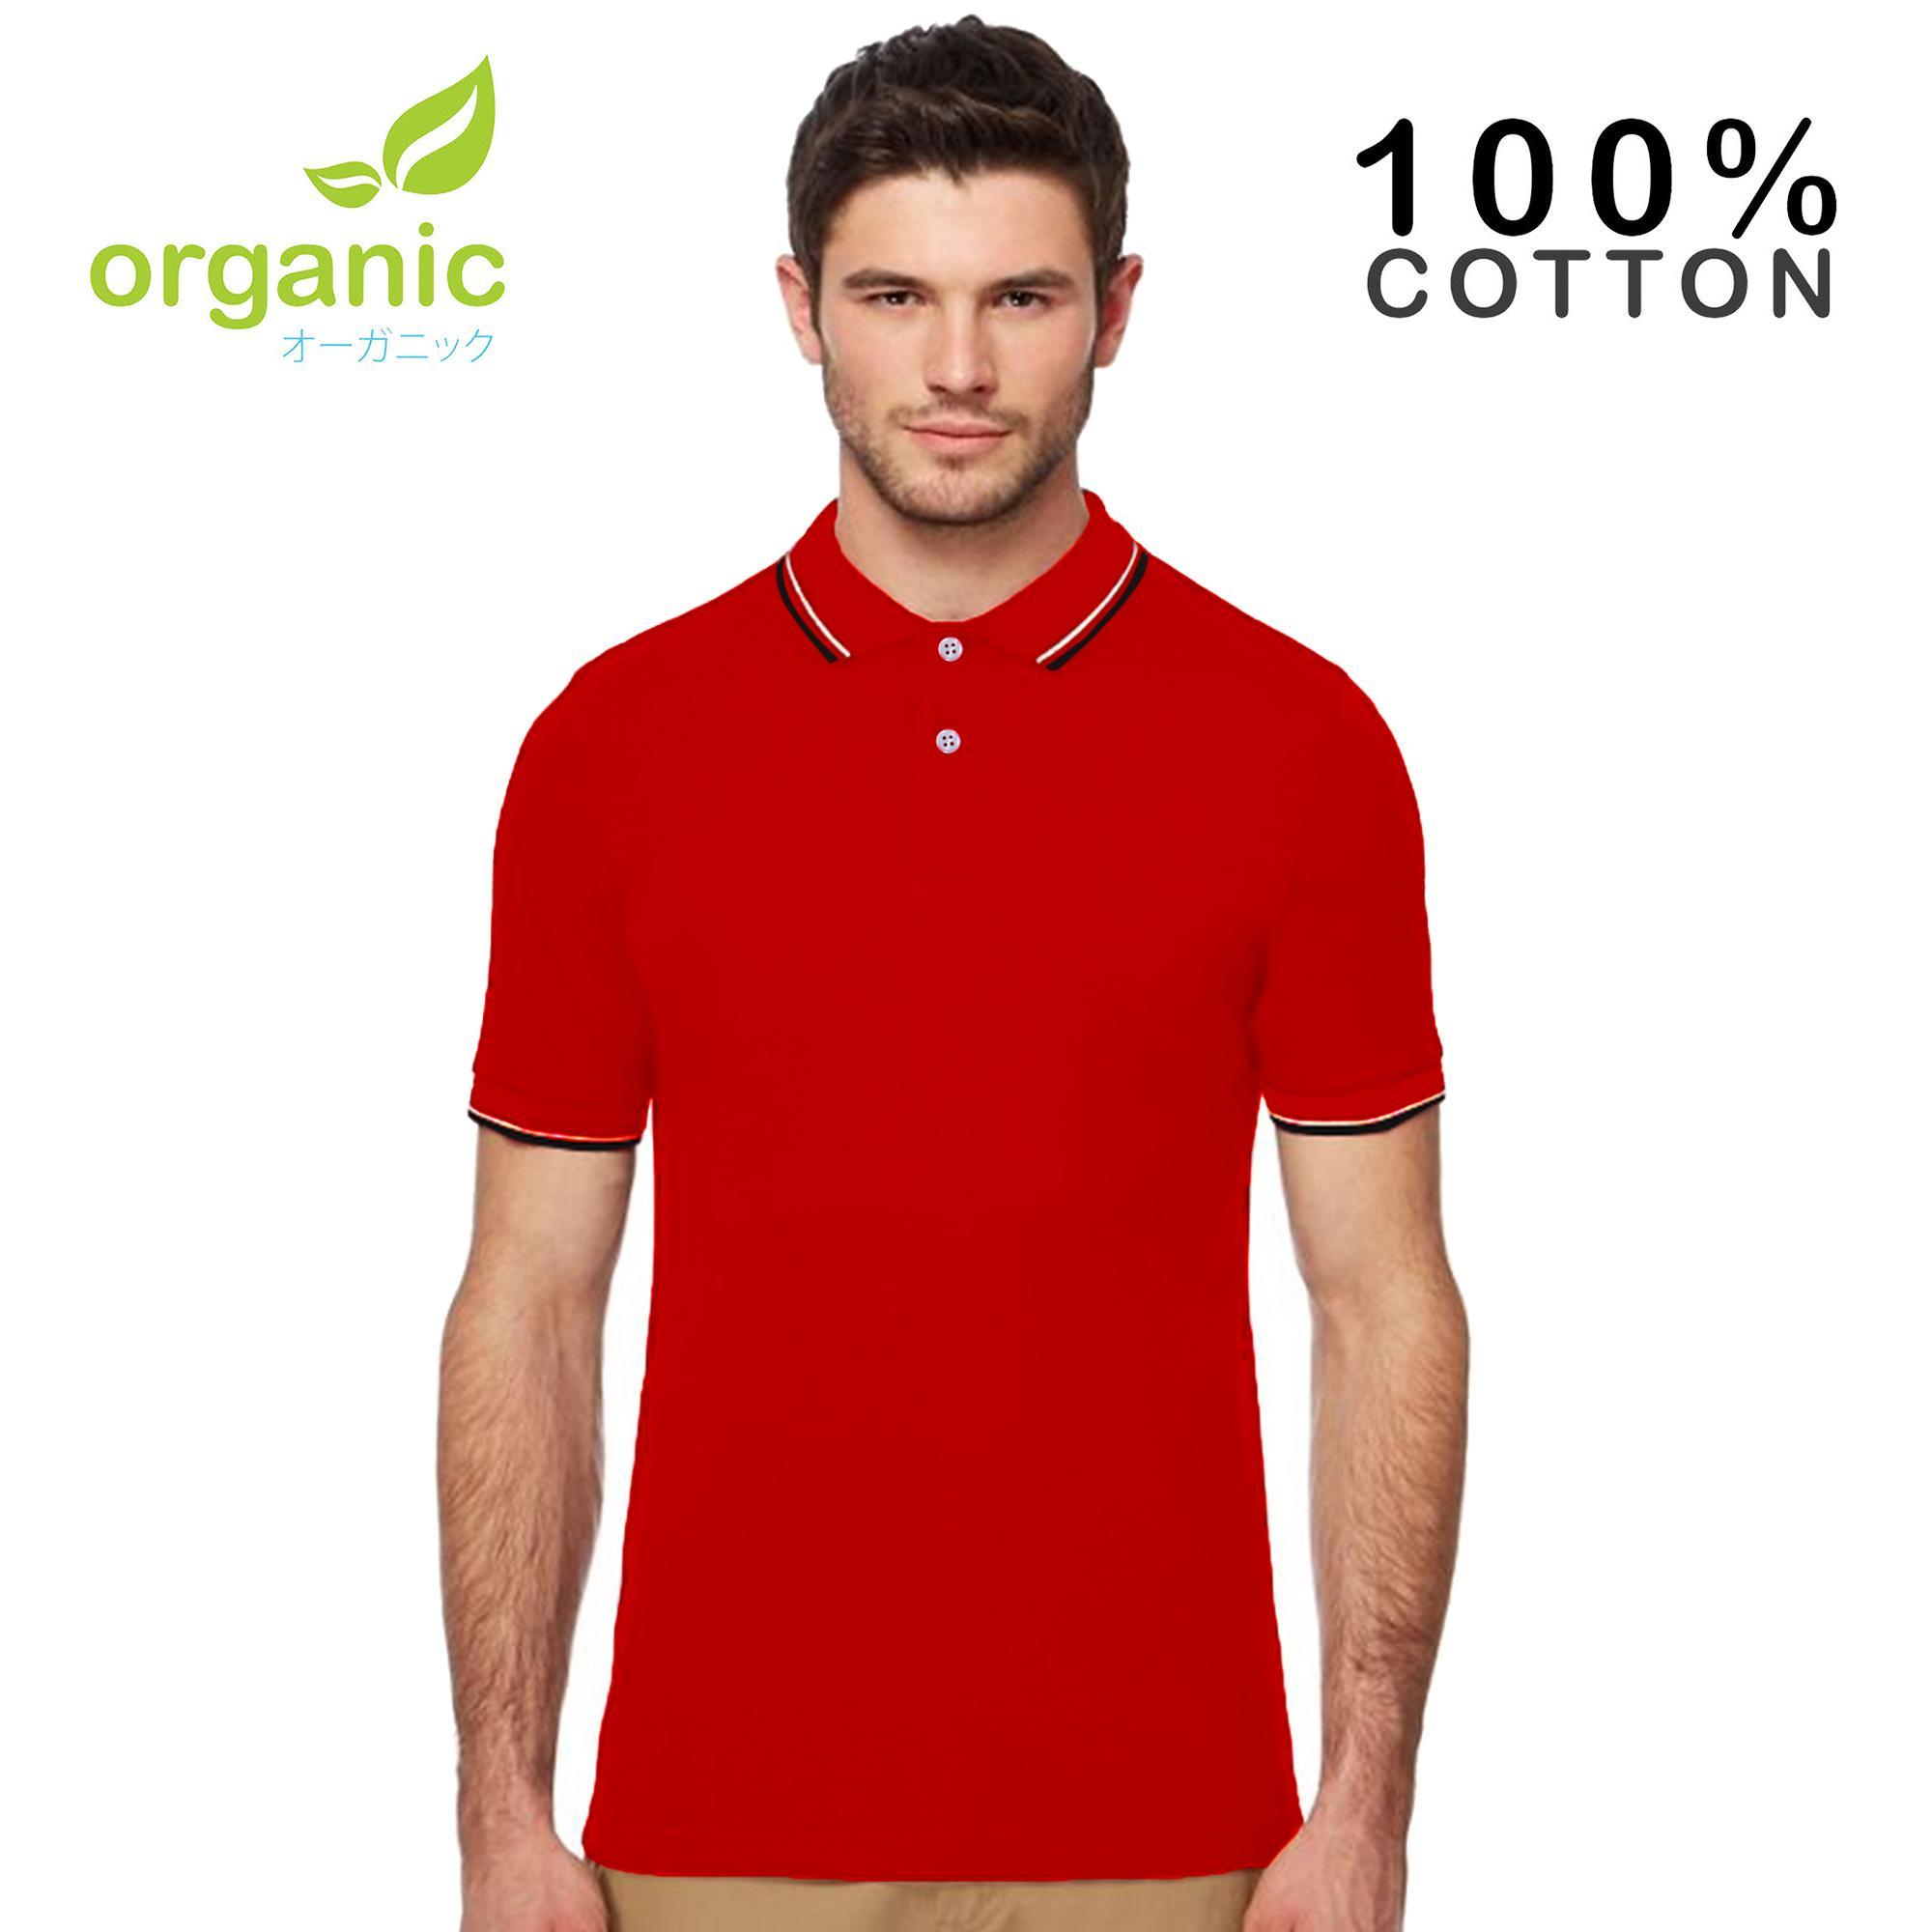 edc167e8bd7 Organic Mens 100% Cotton Vneck Tees t shirt tshirt shirts tshirts v neck tops  top for men